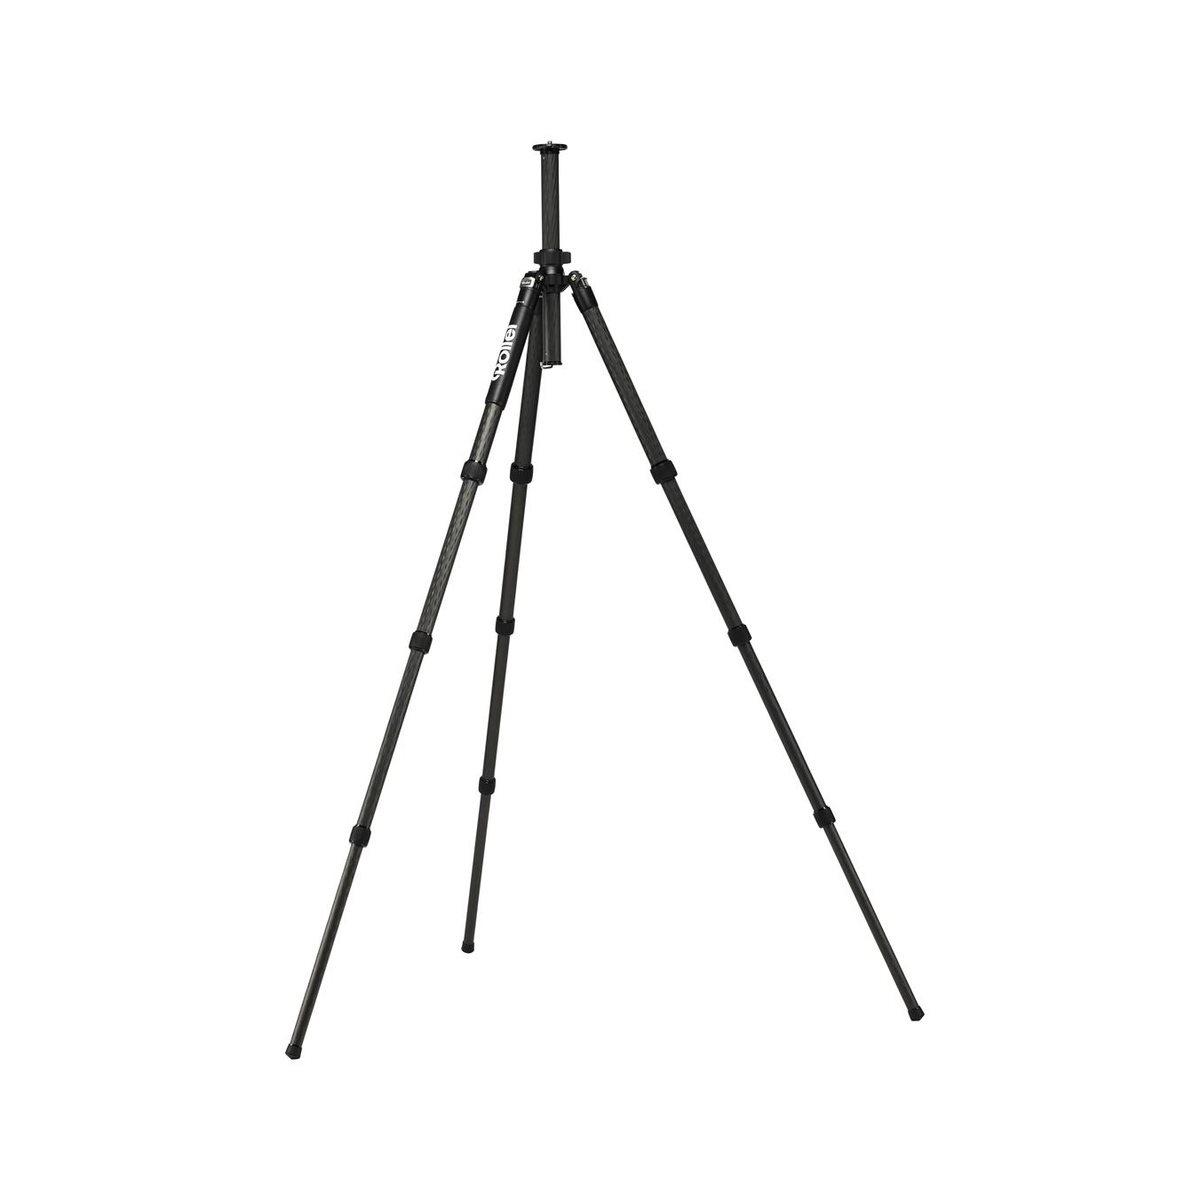 Rollei Solid Carbon Tripod Beta/ Zátěž 22kg/ Vytažený 165 cm/ Karbon/ Černý